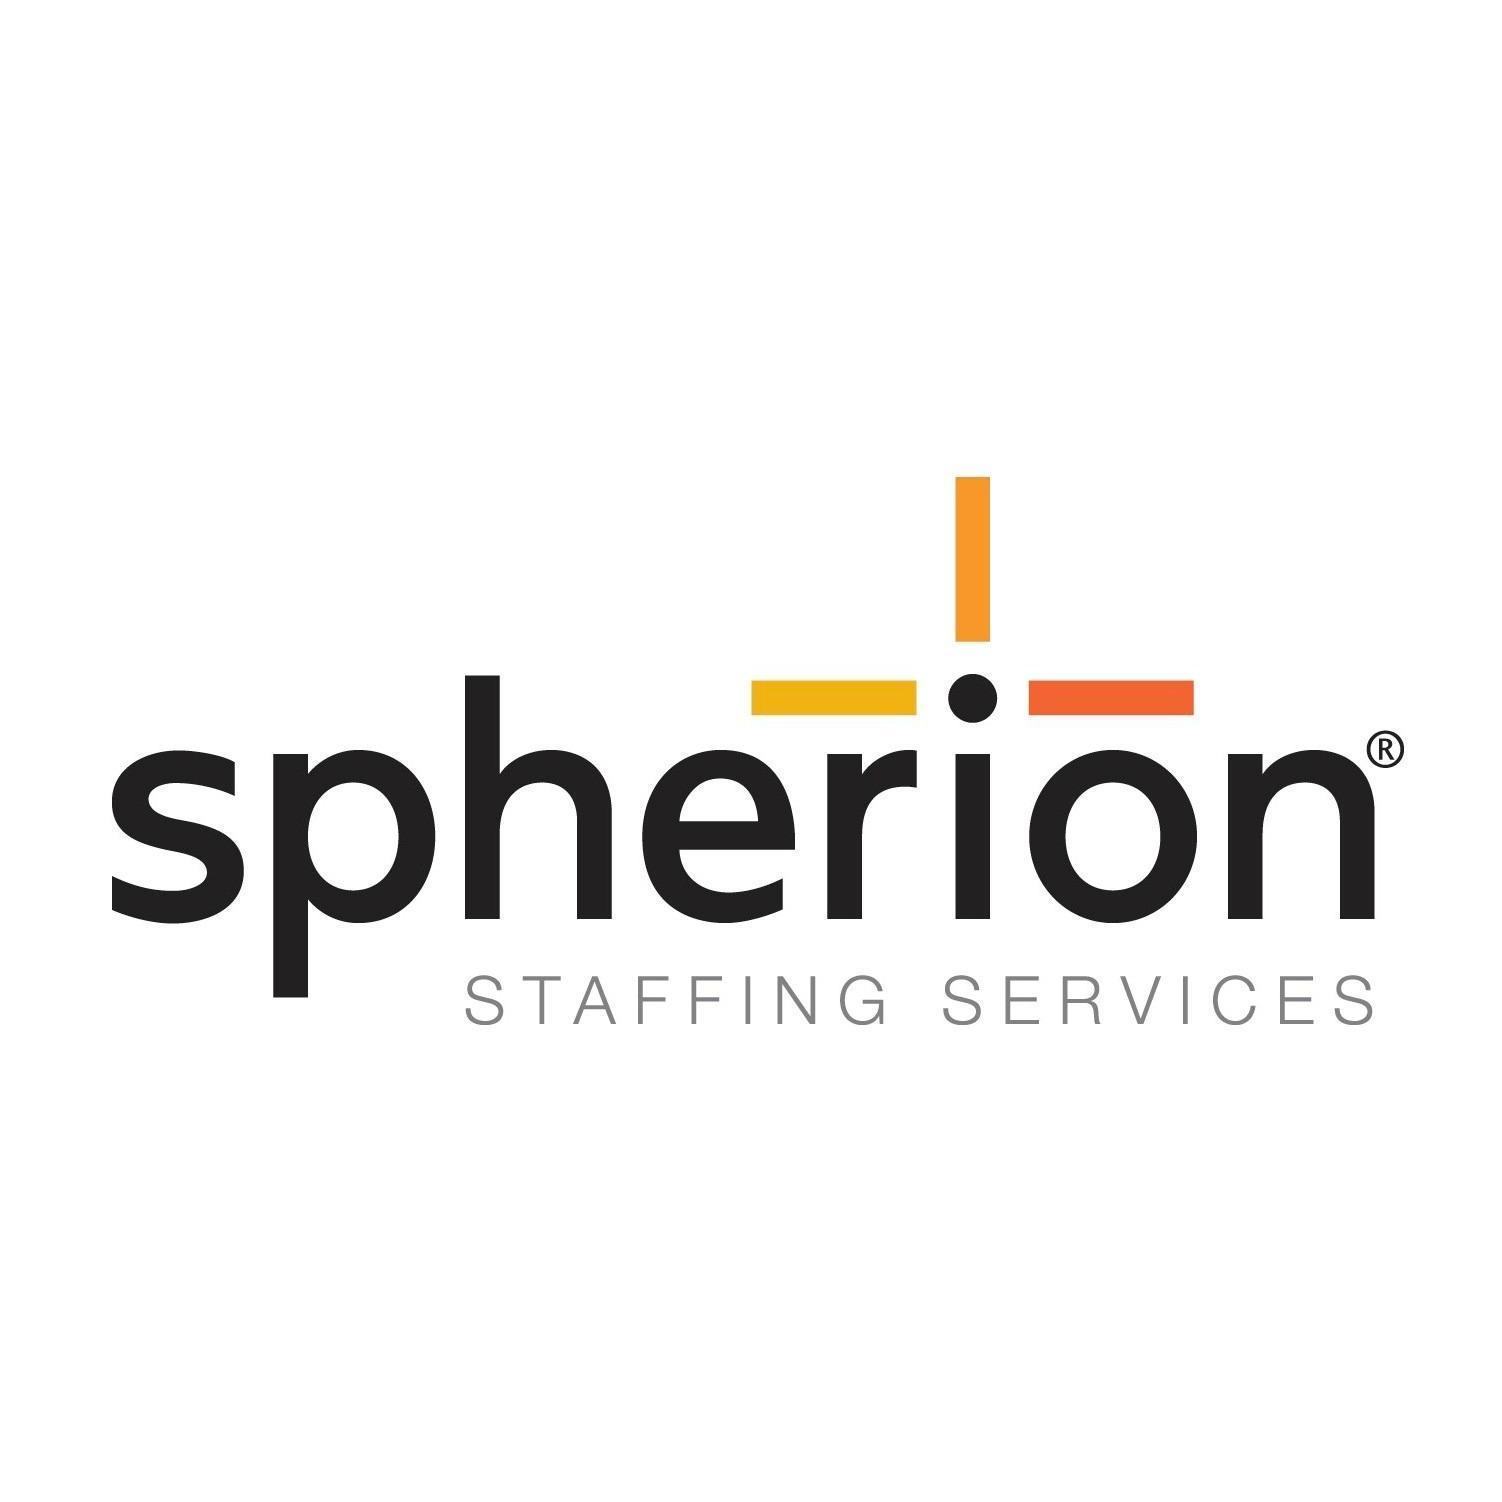 Spherion image 10